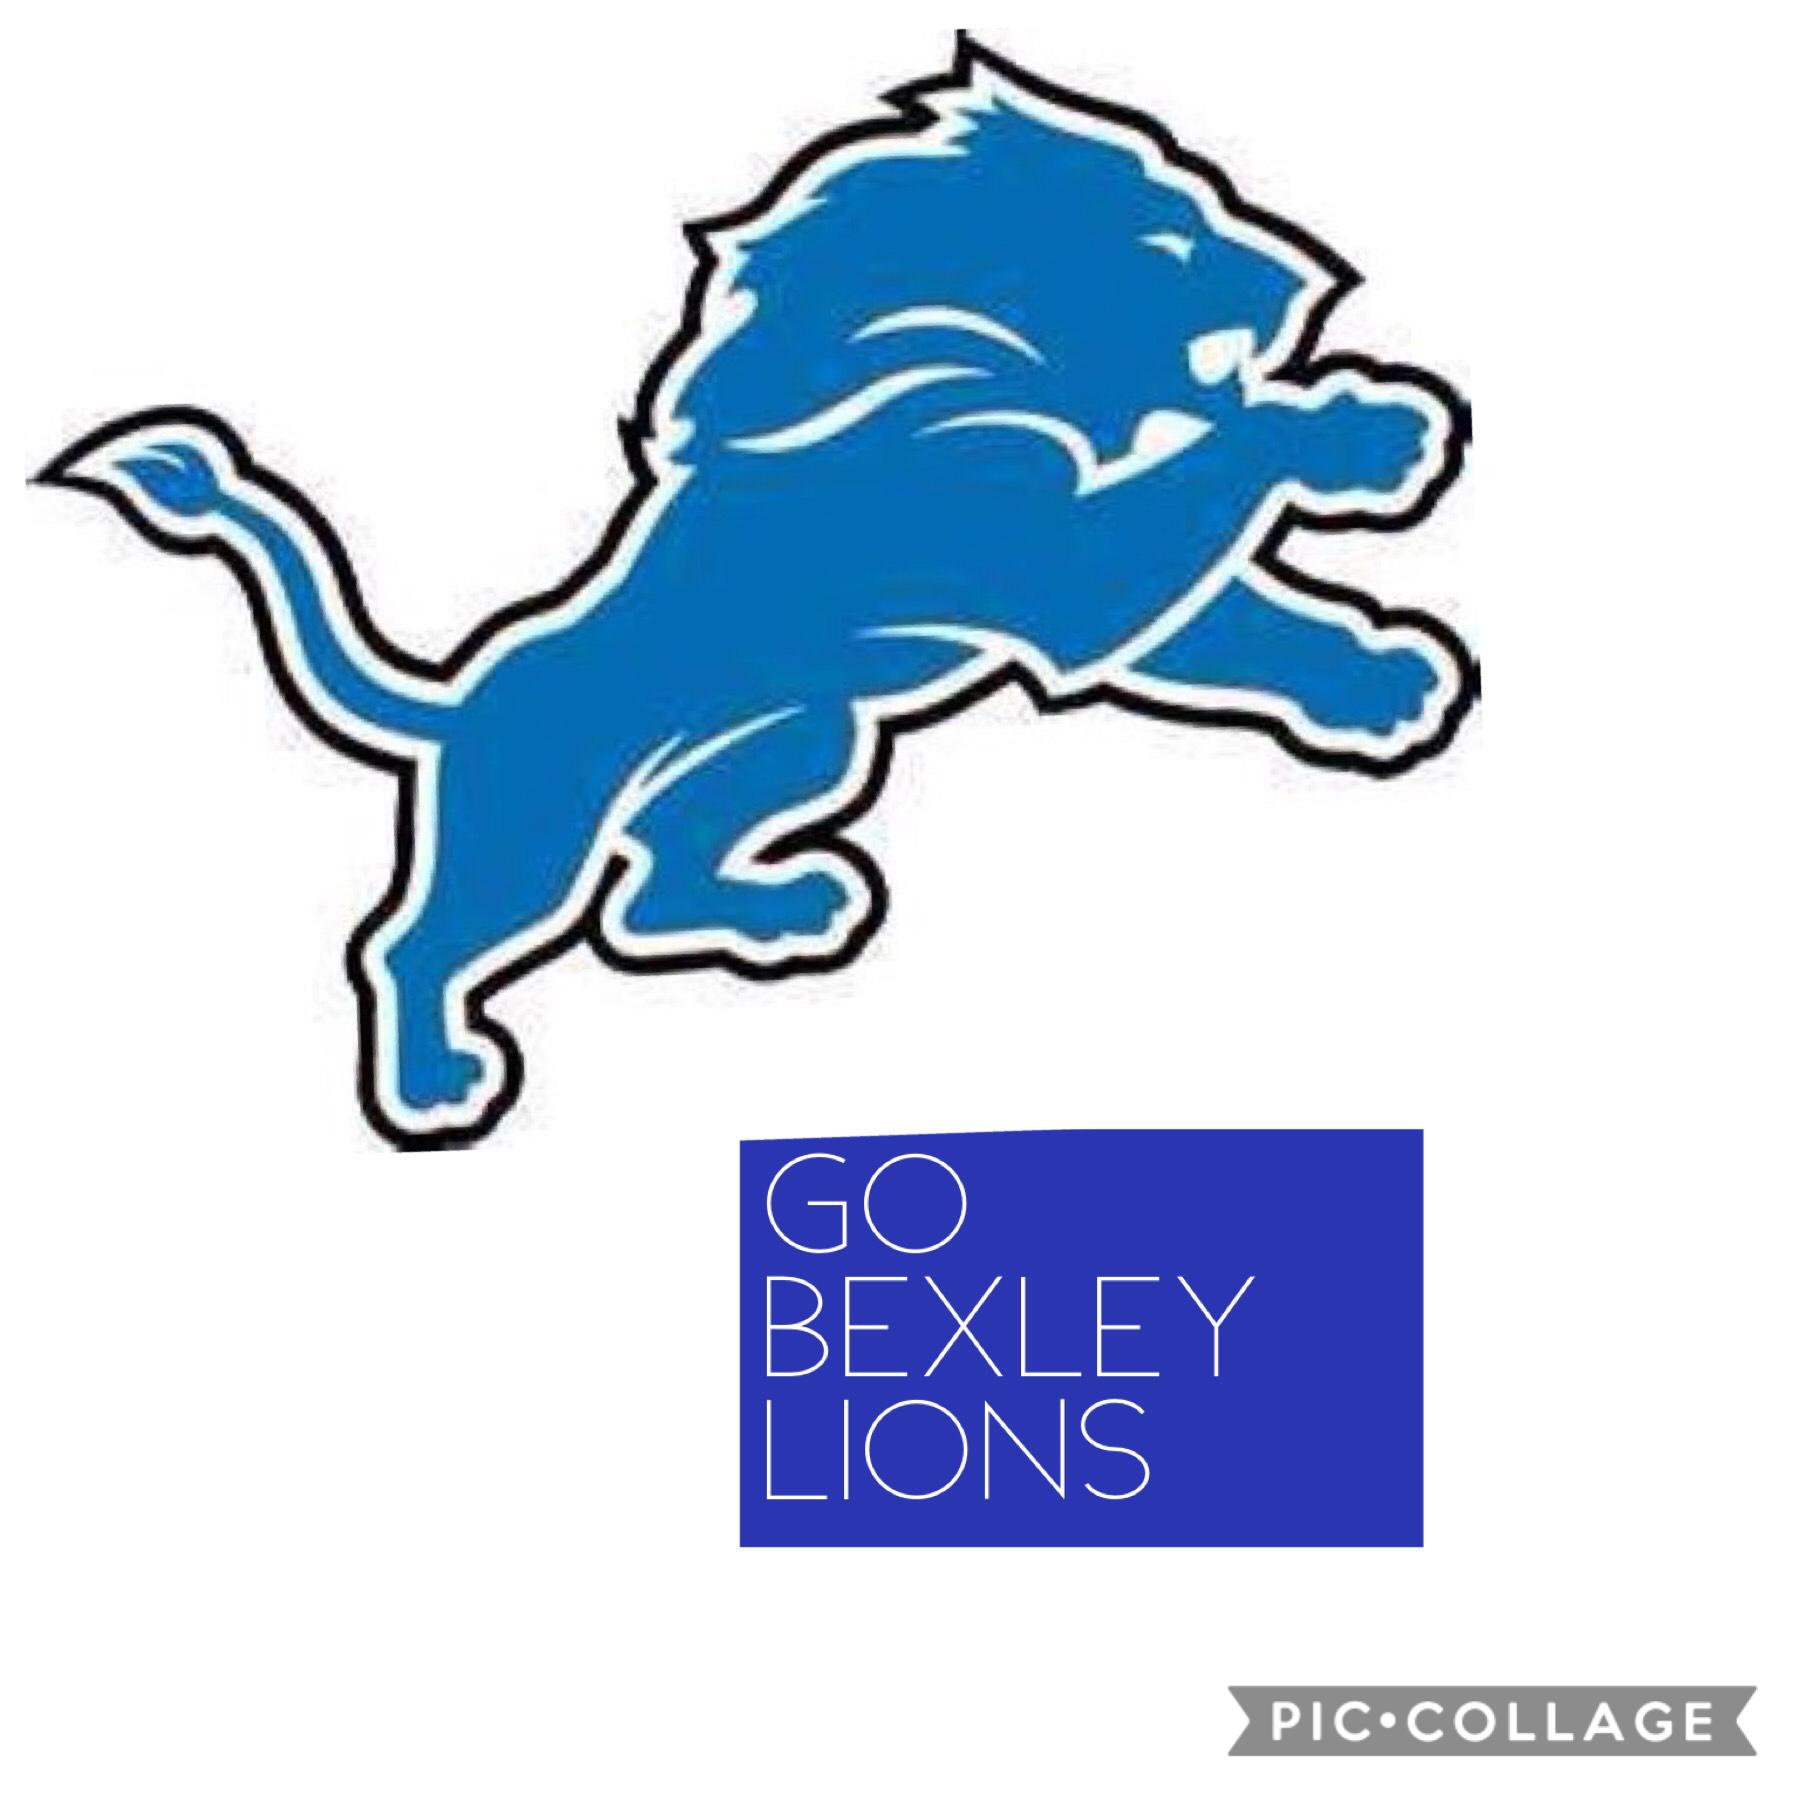 Go Bexley lions follow me pls